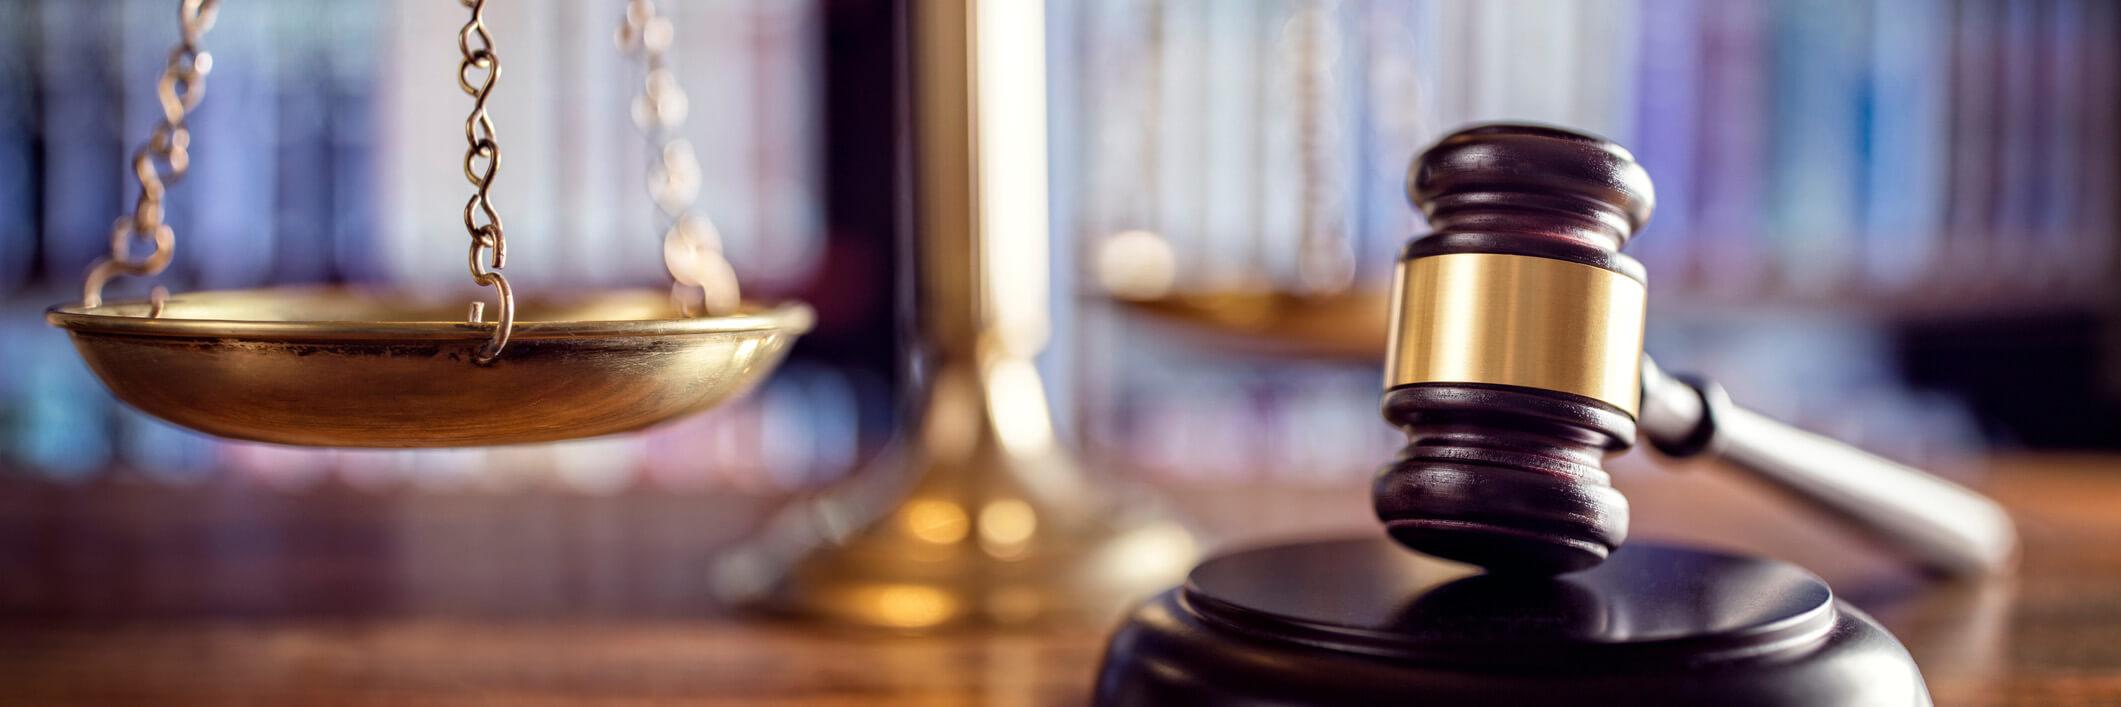 Arbitrator Gavel Scale